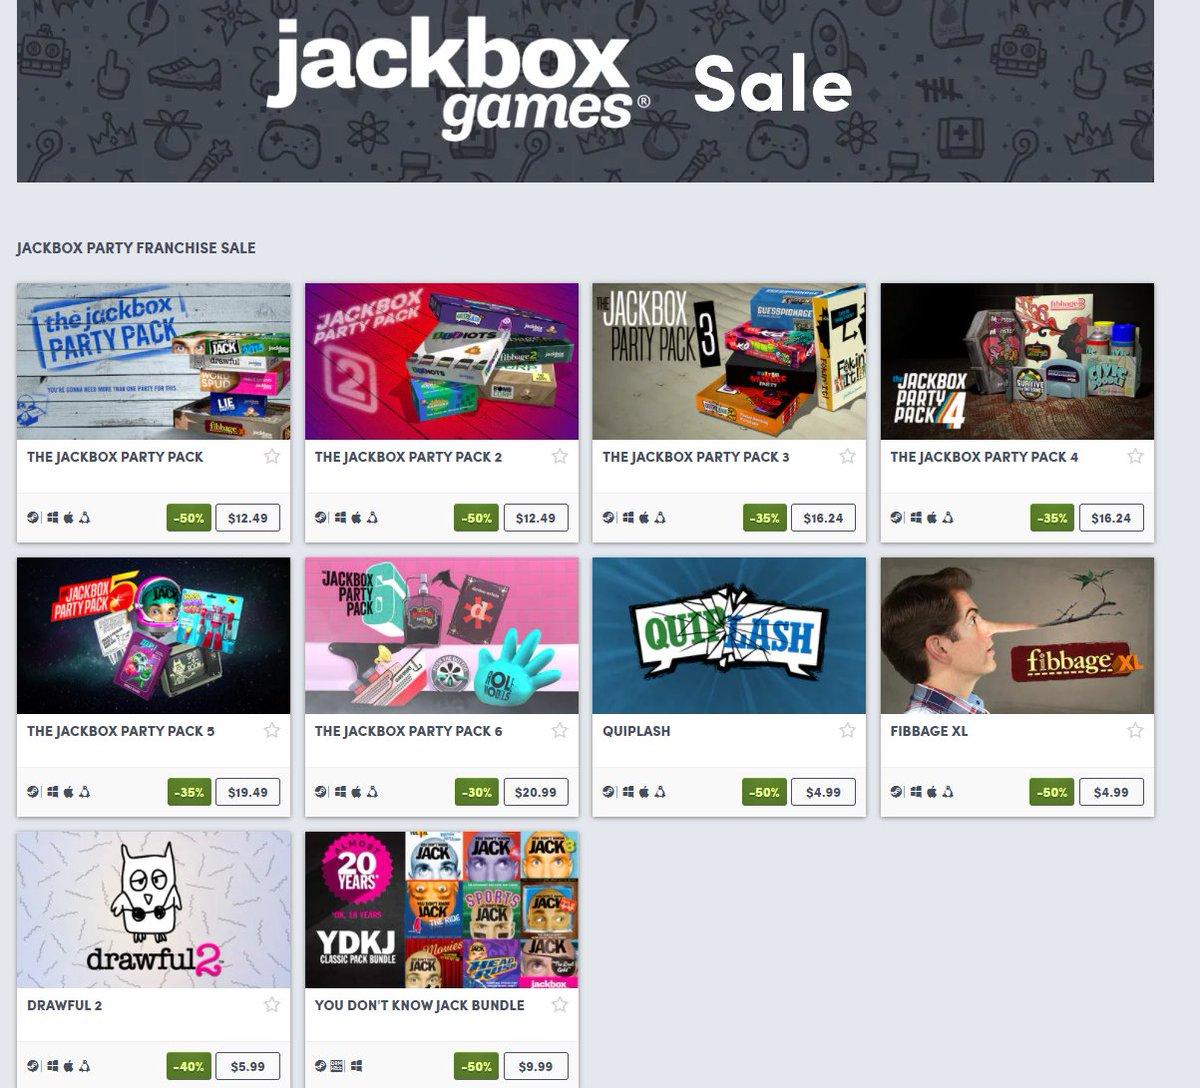 Jackbox Party franchise sale on Humble 2